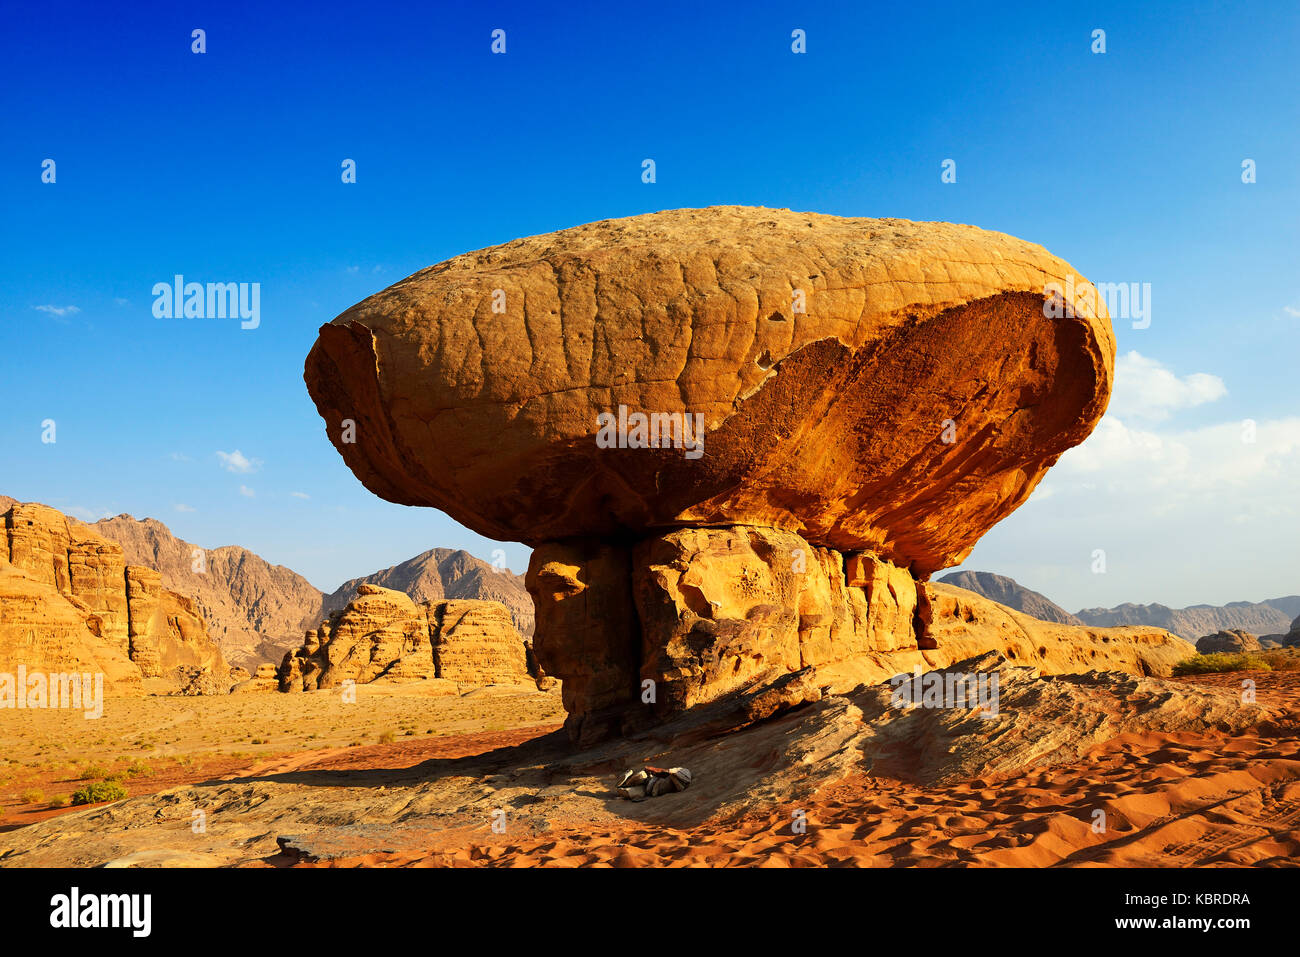 Mushroom-Rock, Al Fetra, Wadi Rum, Jordan - Stock Image